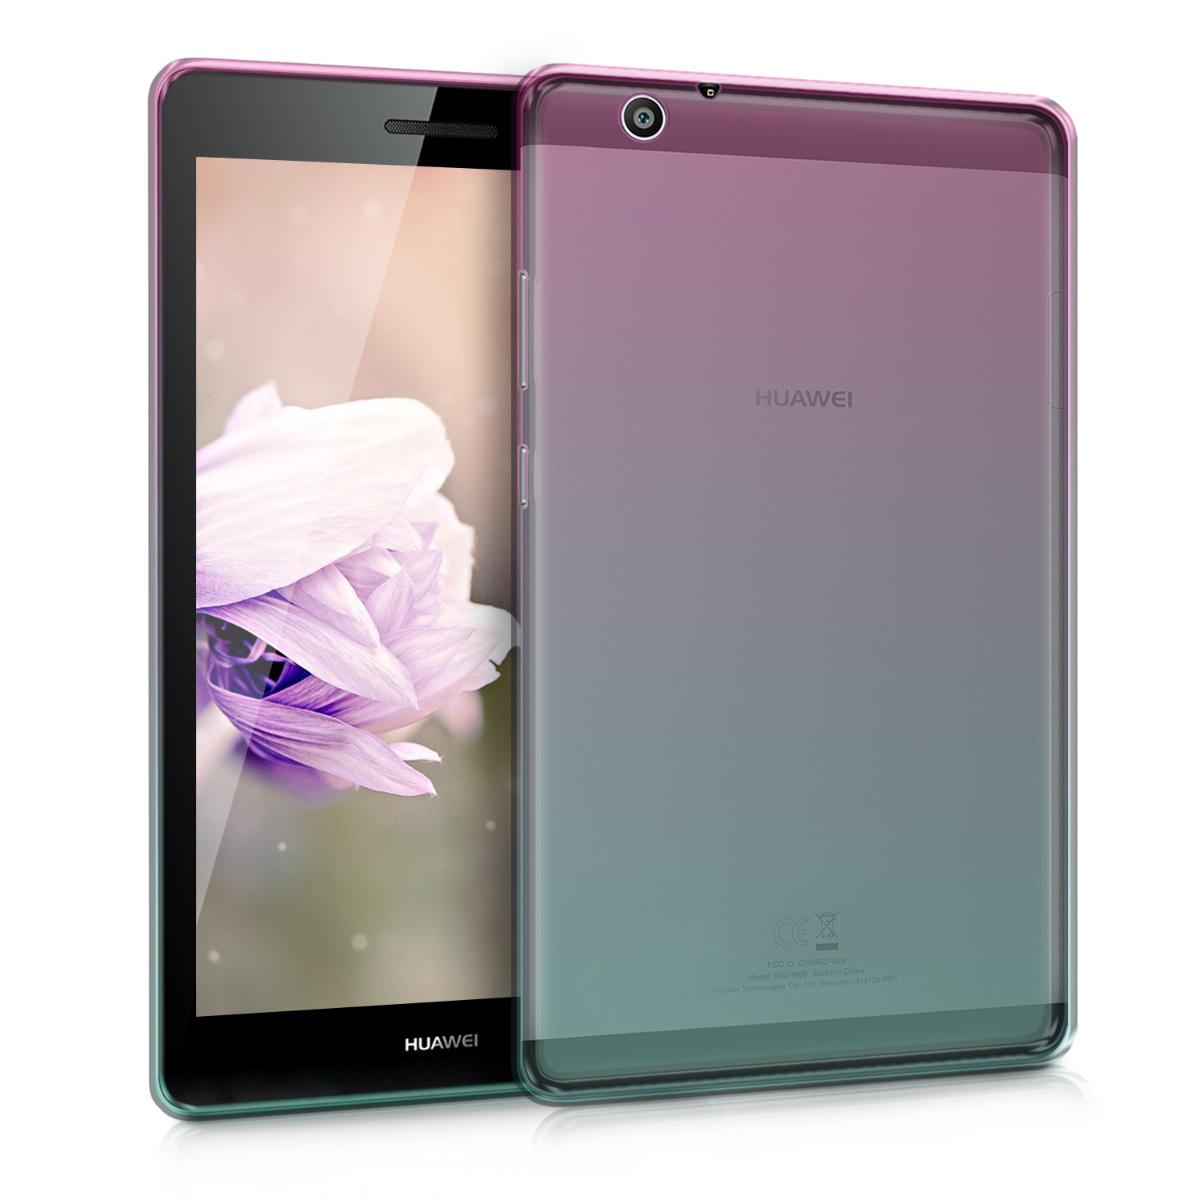 KW Θήκη Σιλικόνης Huawei MediaPad T3 7.0 3G - Soft Flexible Shock Absorbent Protective Cover - Dark Pink / Blue / Transparent (44408.01)